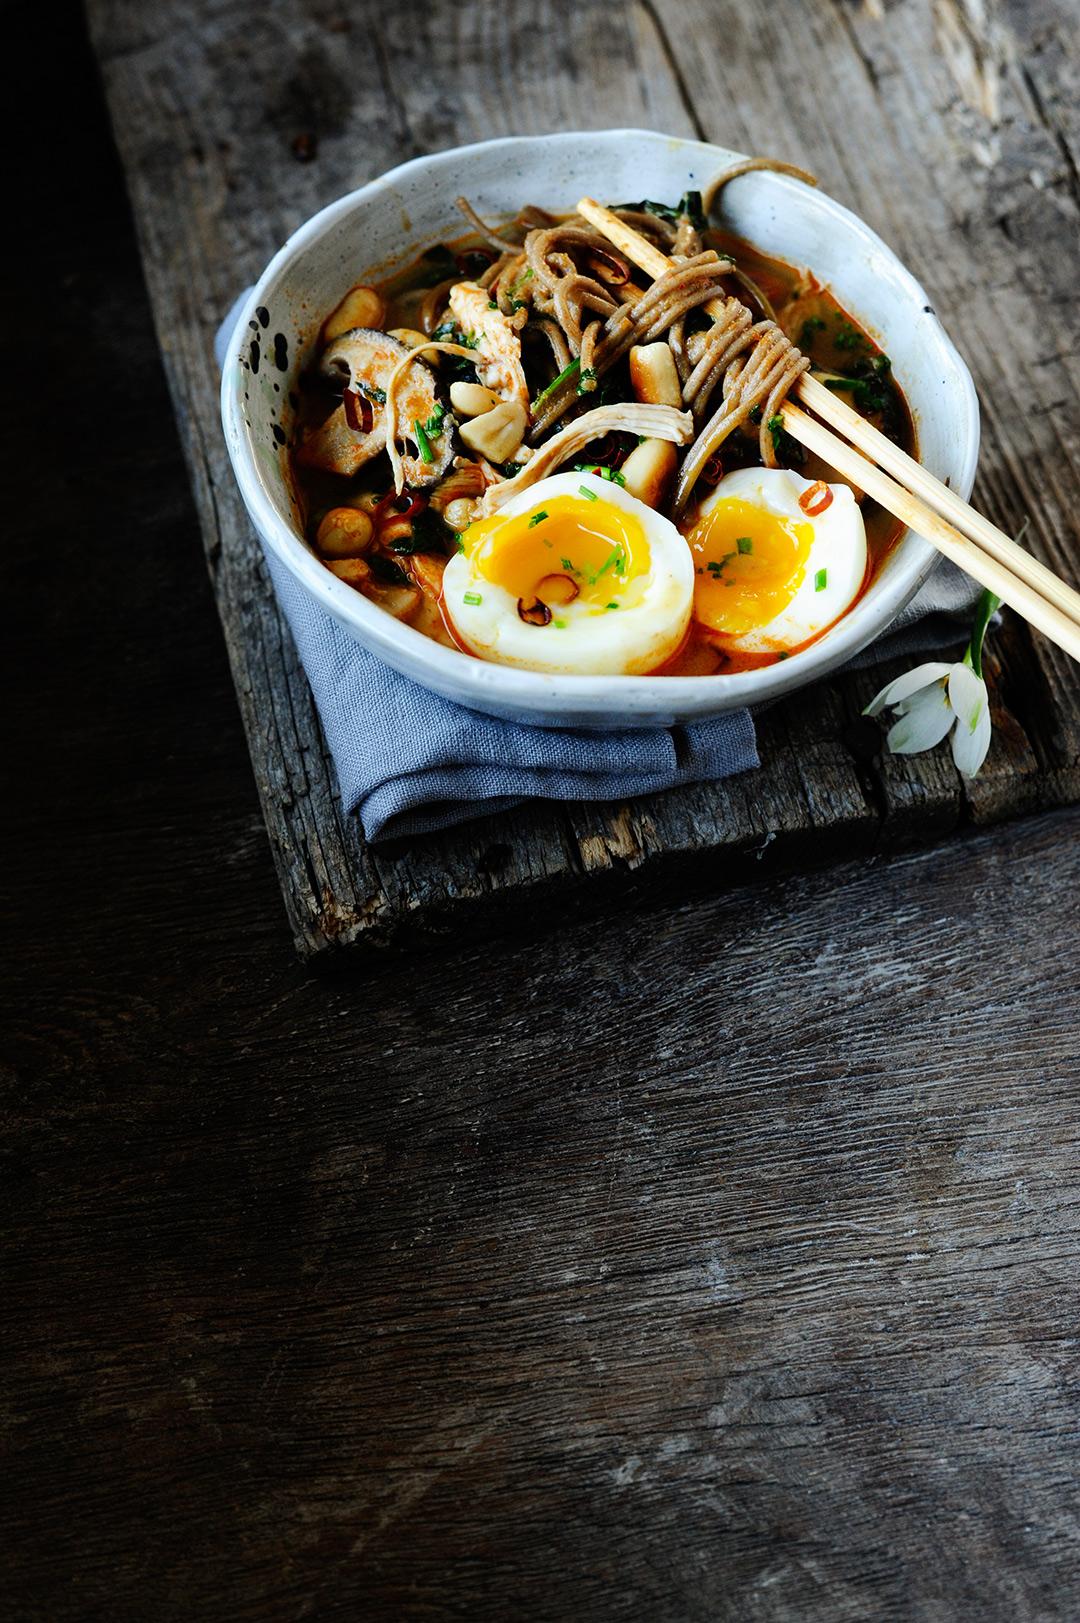 serving dumplings | Chicken miso ramen with peanut butter